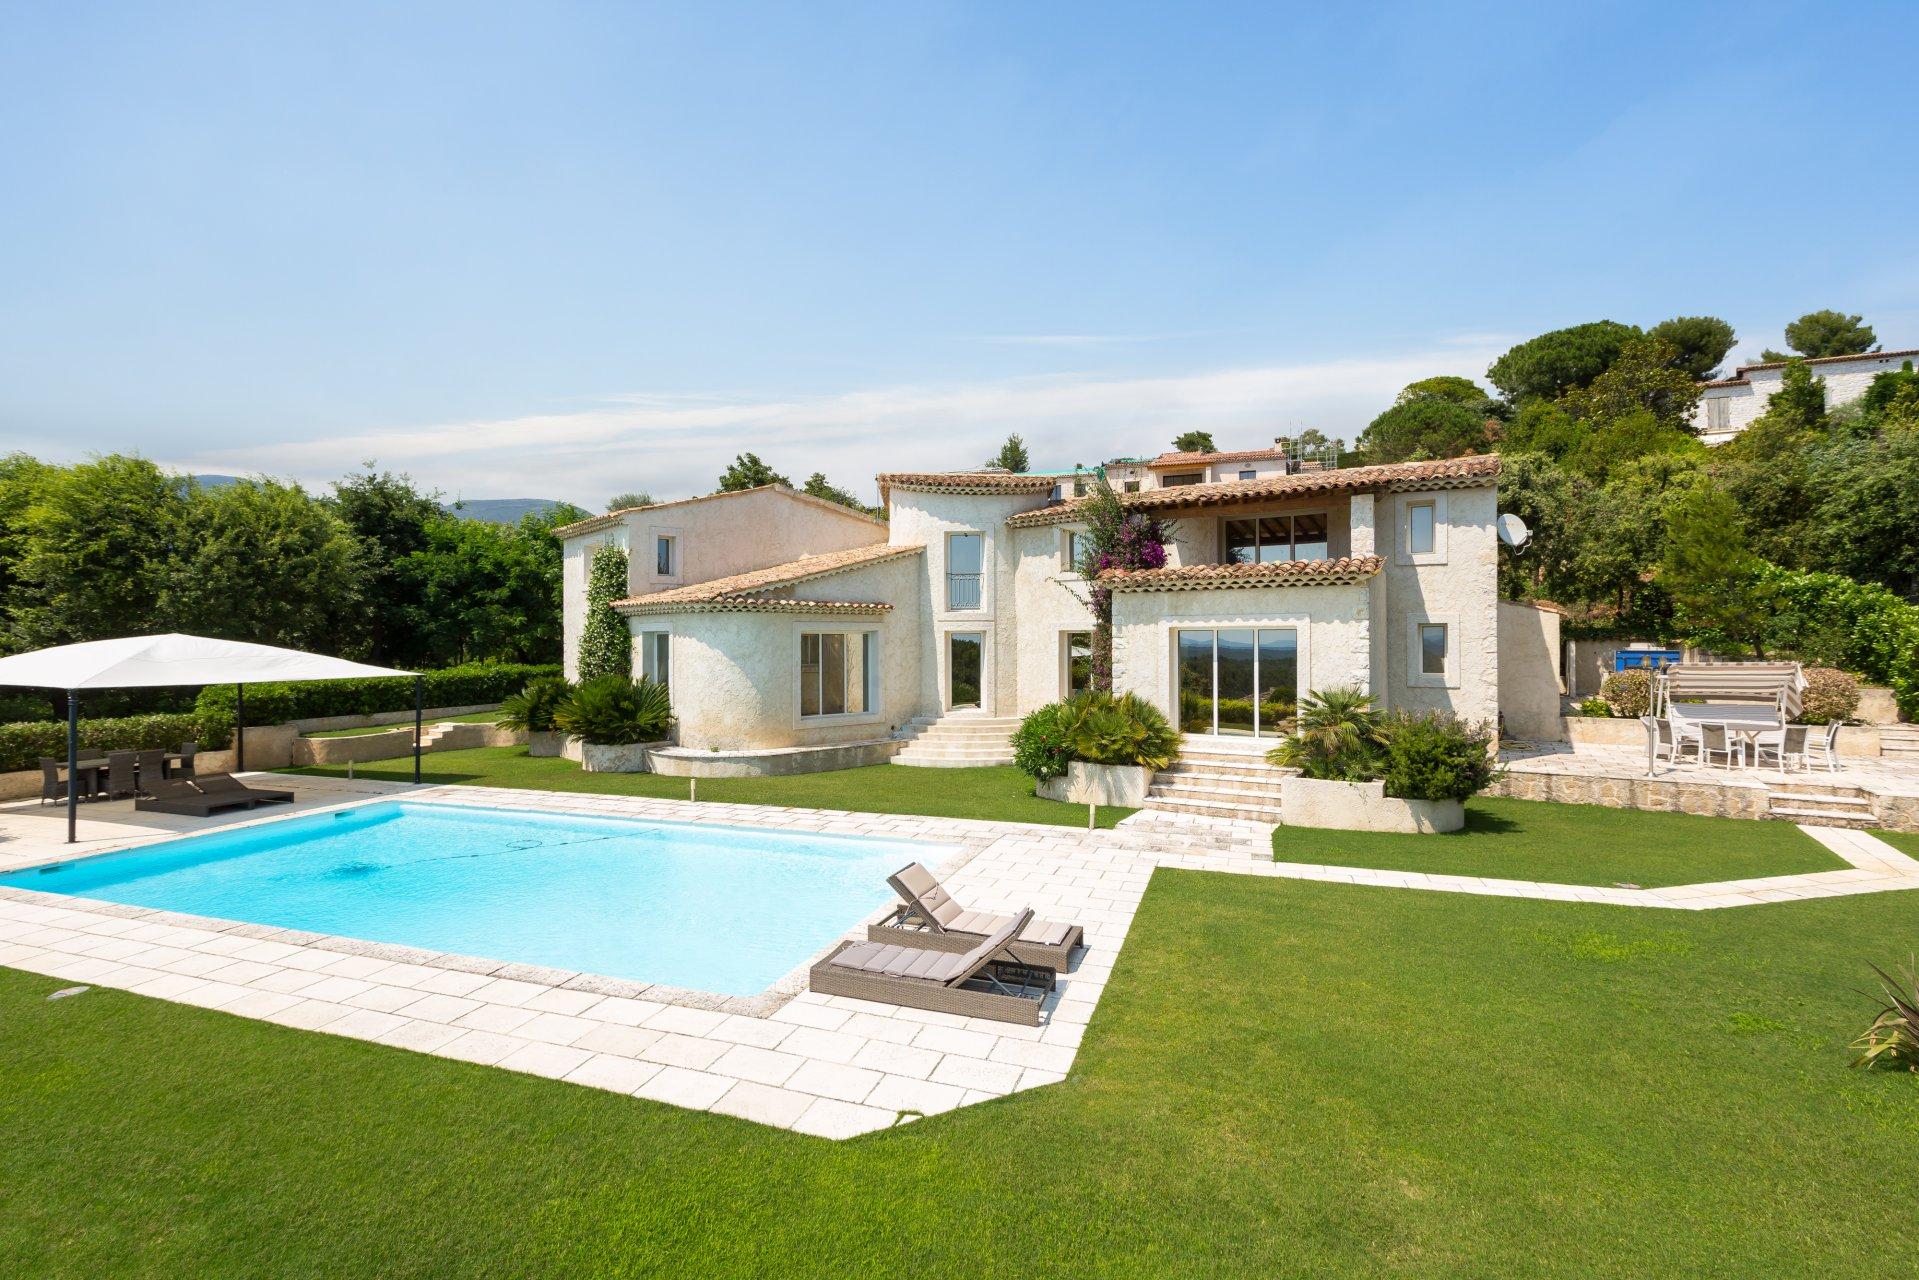 ad sale property saint paul de vence 06570 7 rooms ref. Black Bedroom Furniture Sets. Home Design Ideas